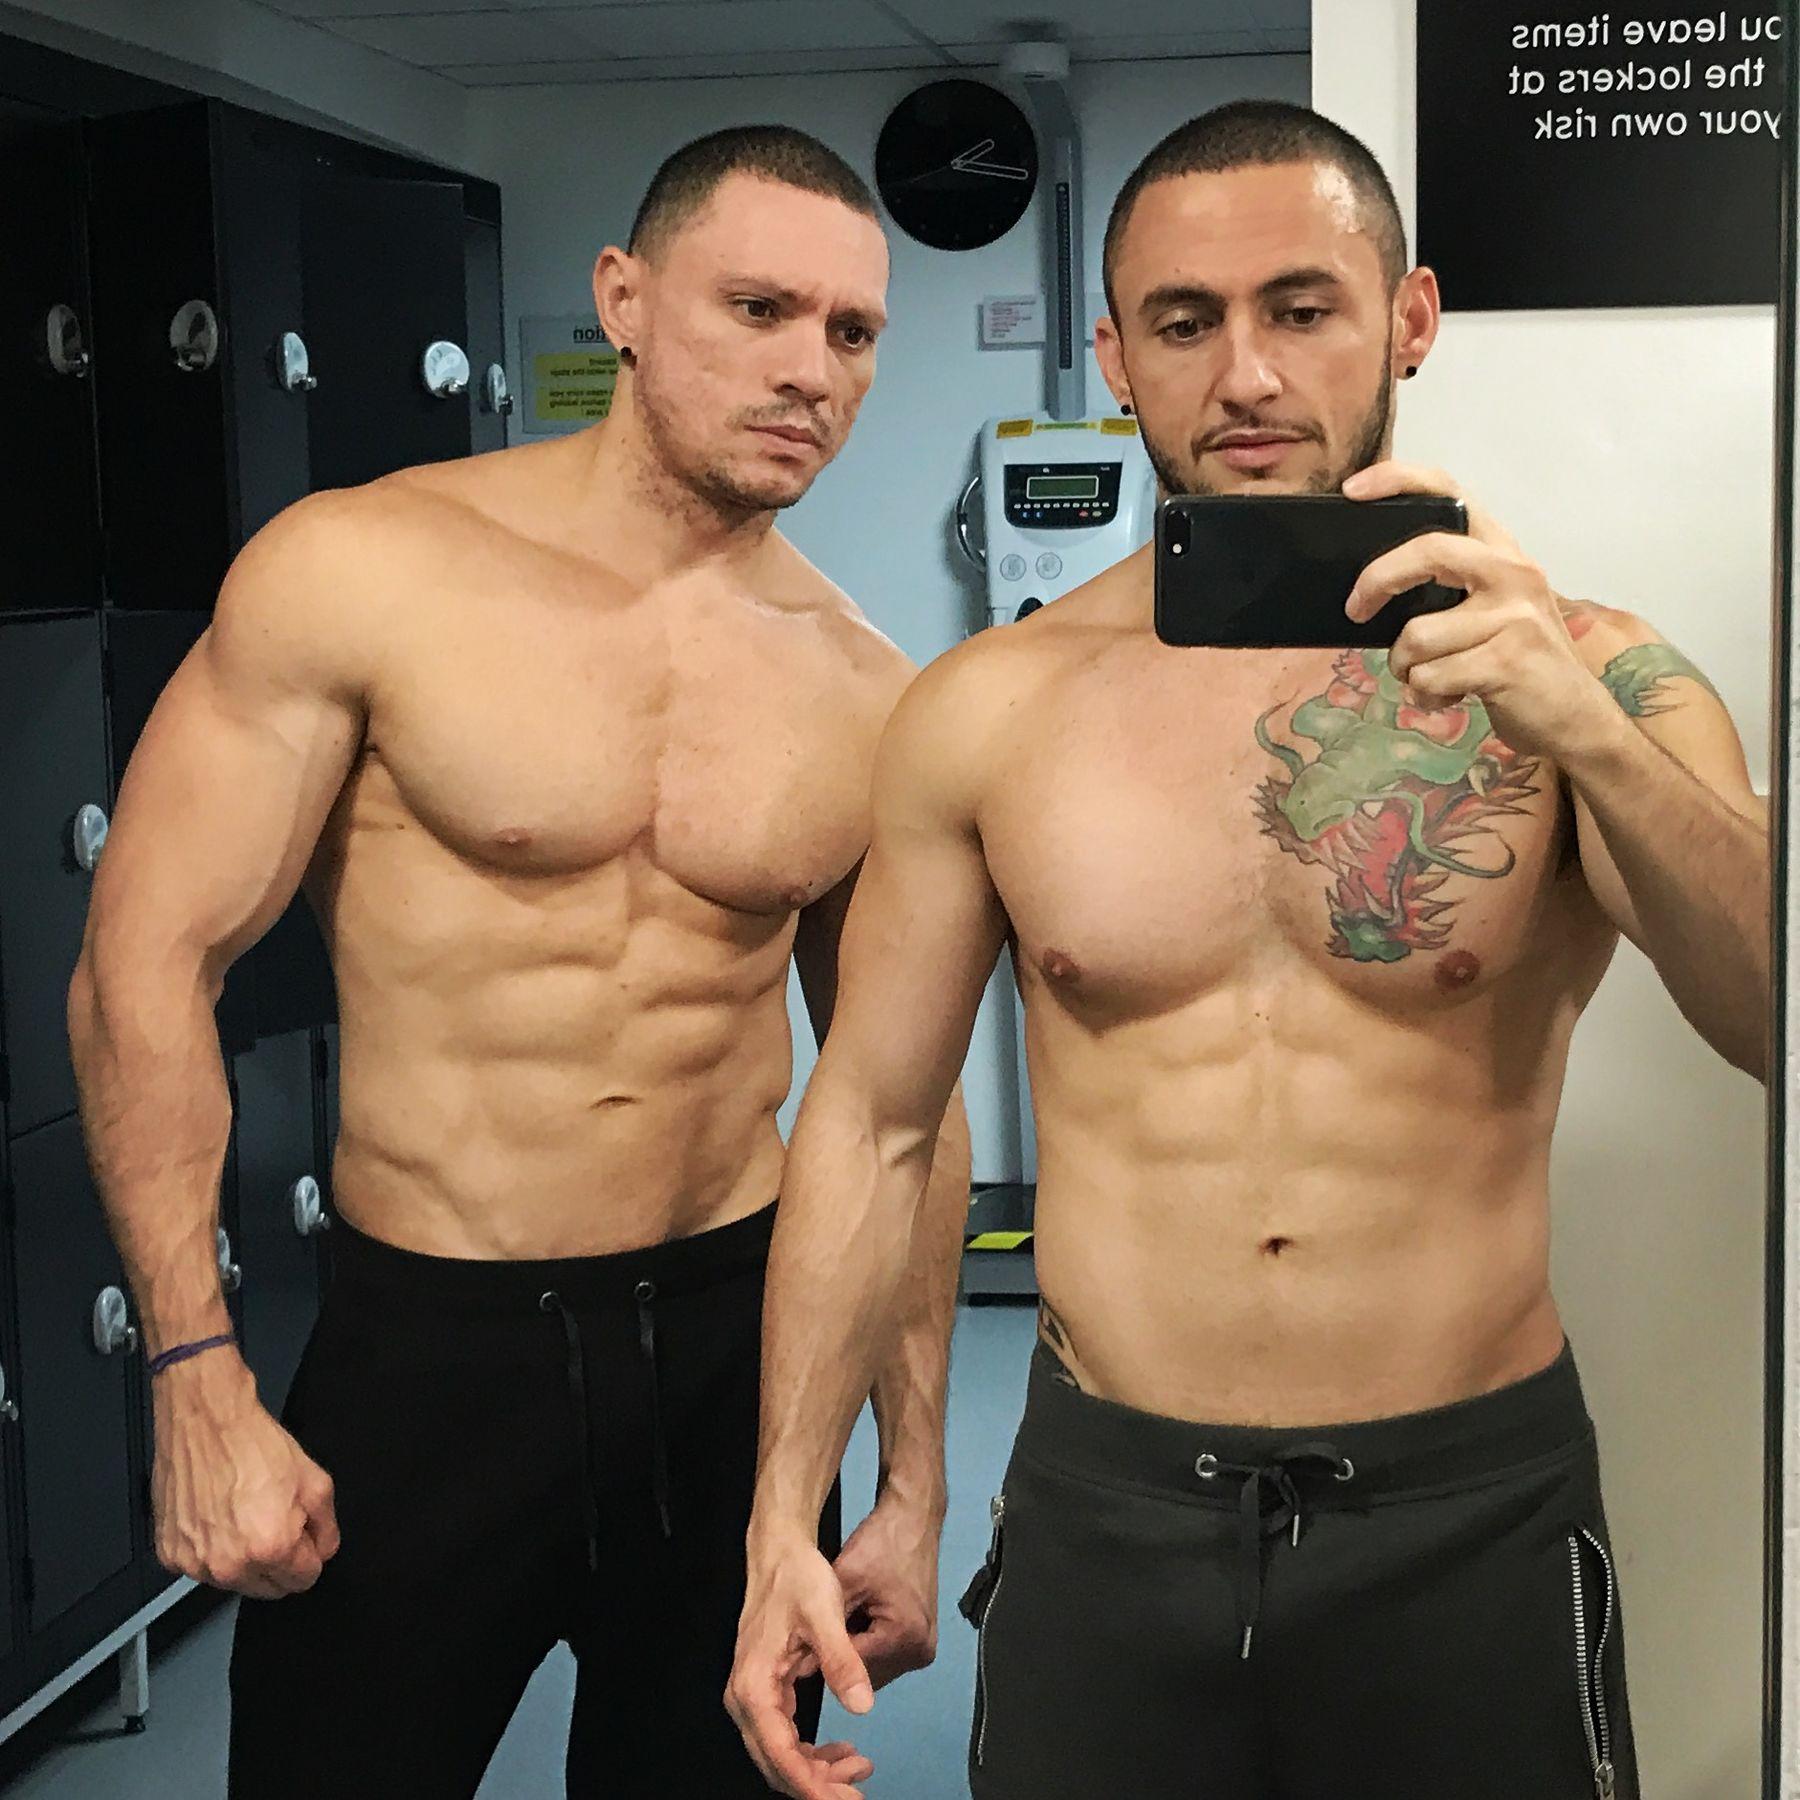 male escorts brazil